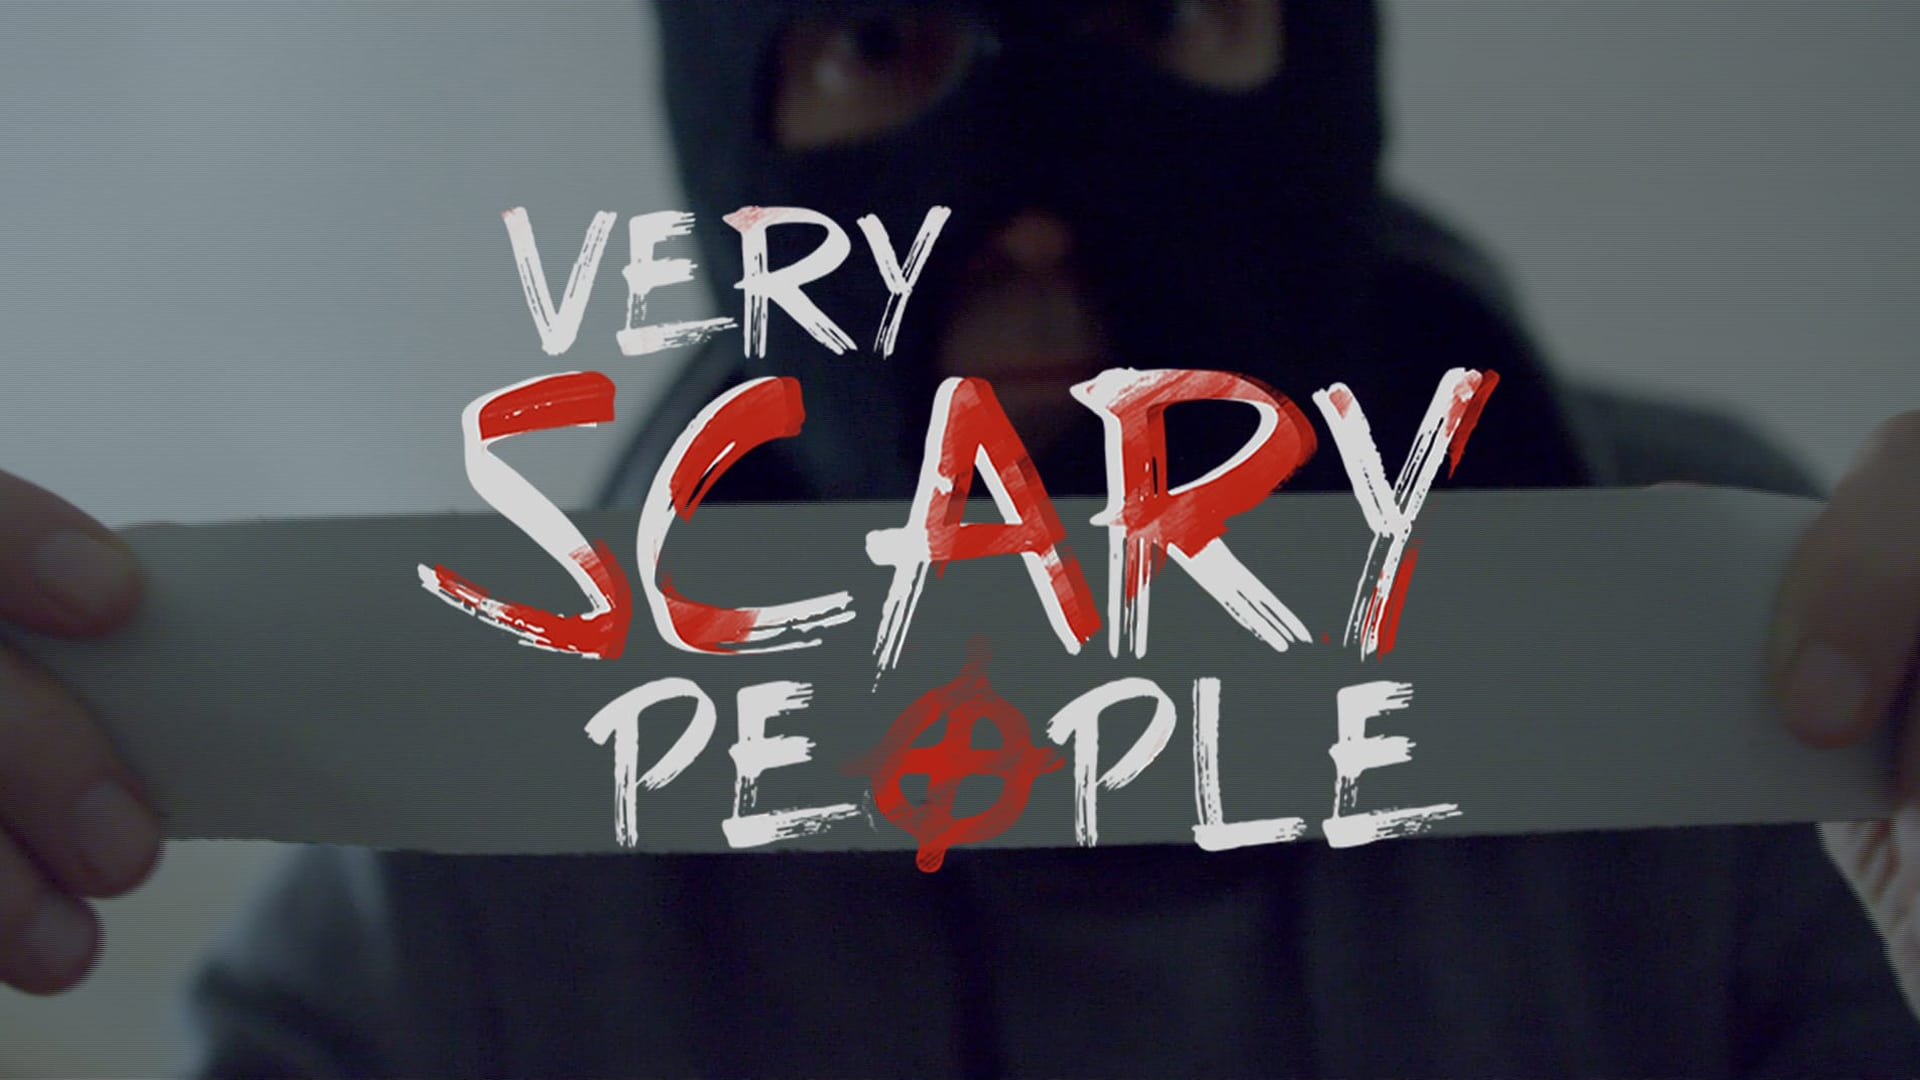 Very Scary People Season 2 Episode 3